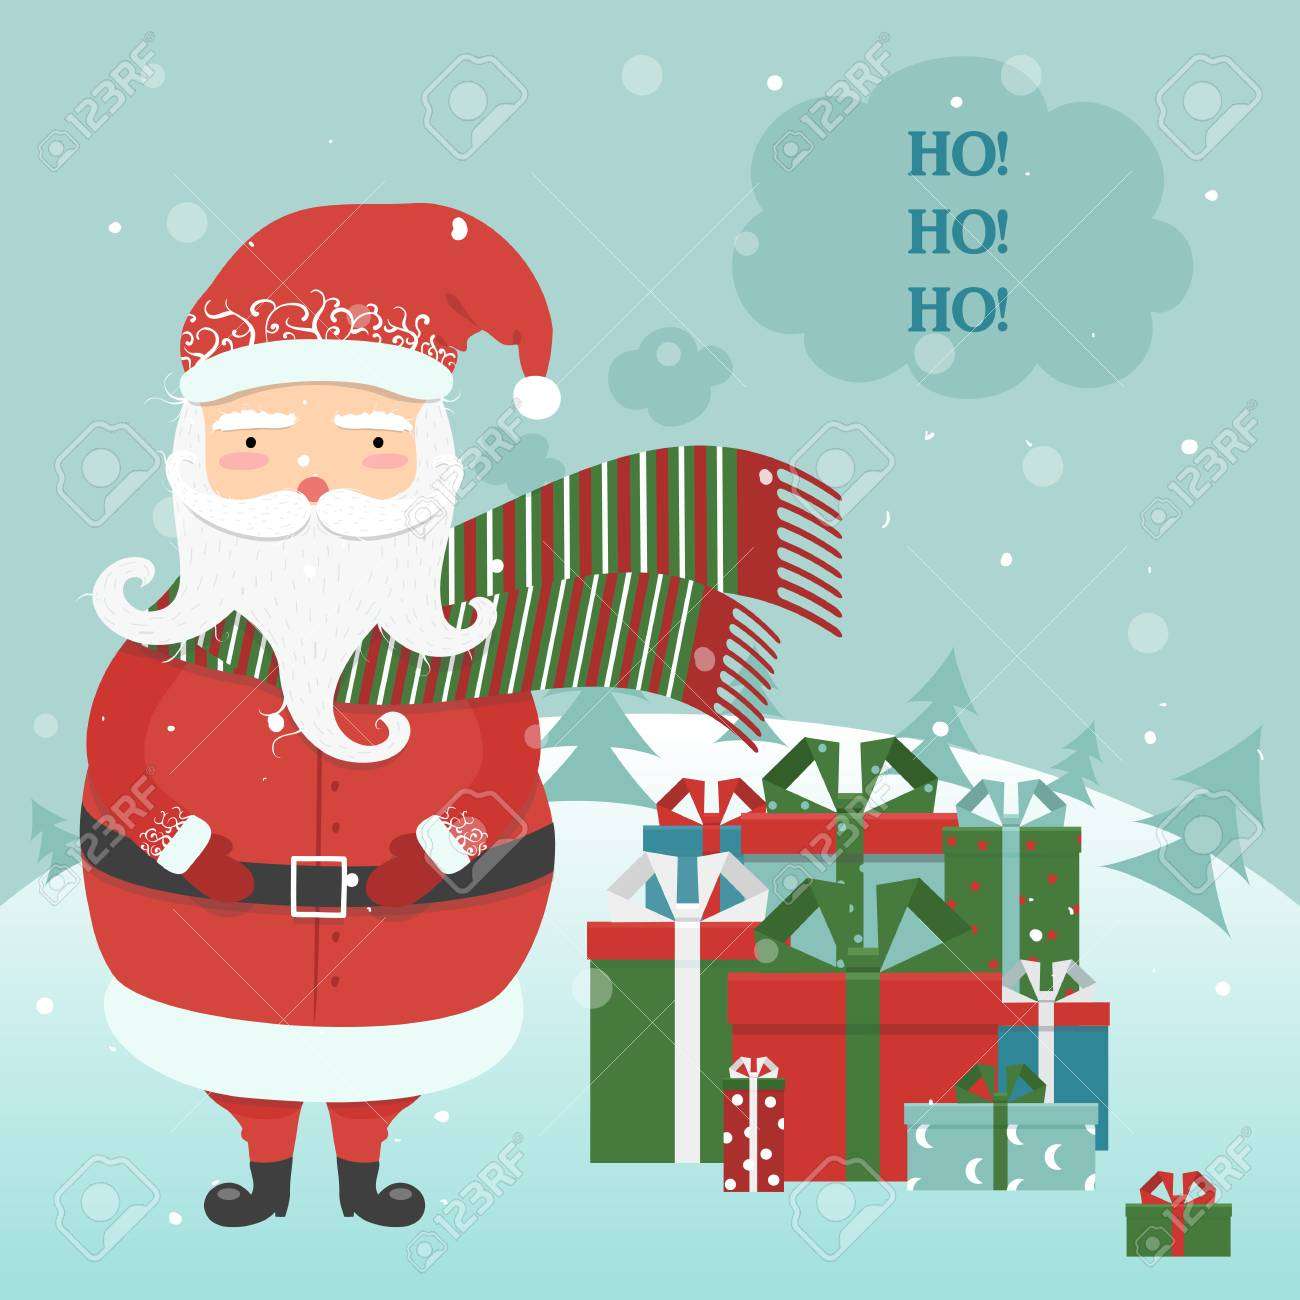 Ilustracao Vetorial De Natal Ano Novo Concept Jolly Desenhos